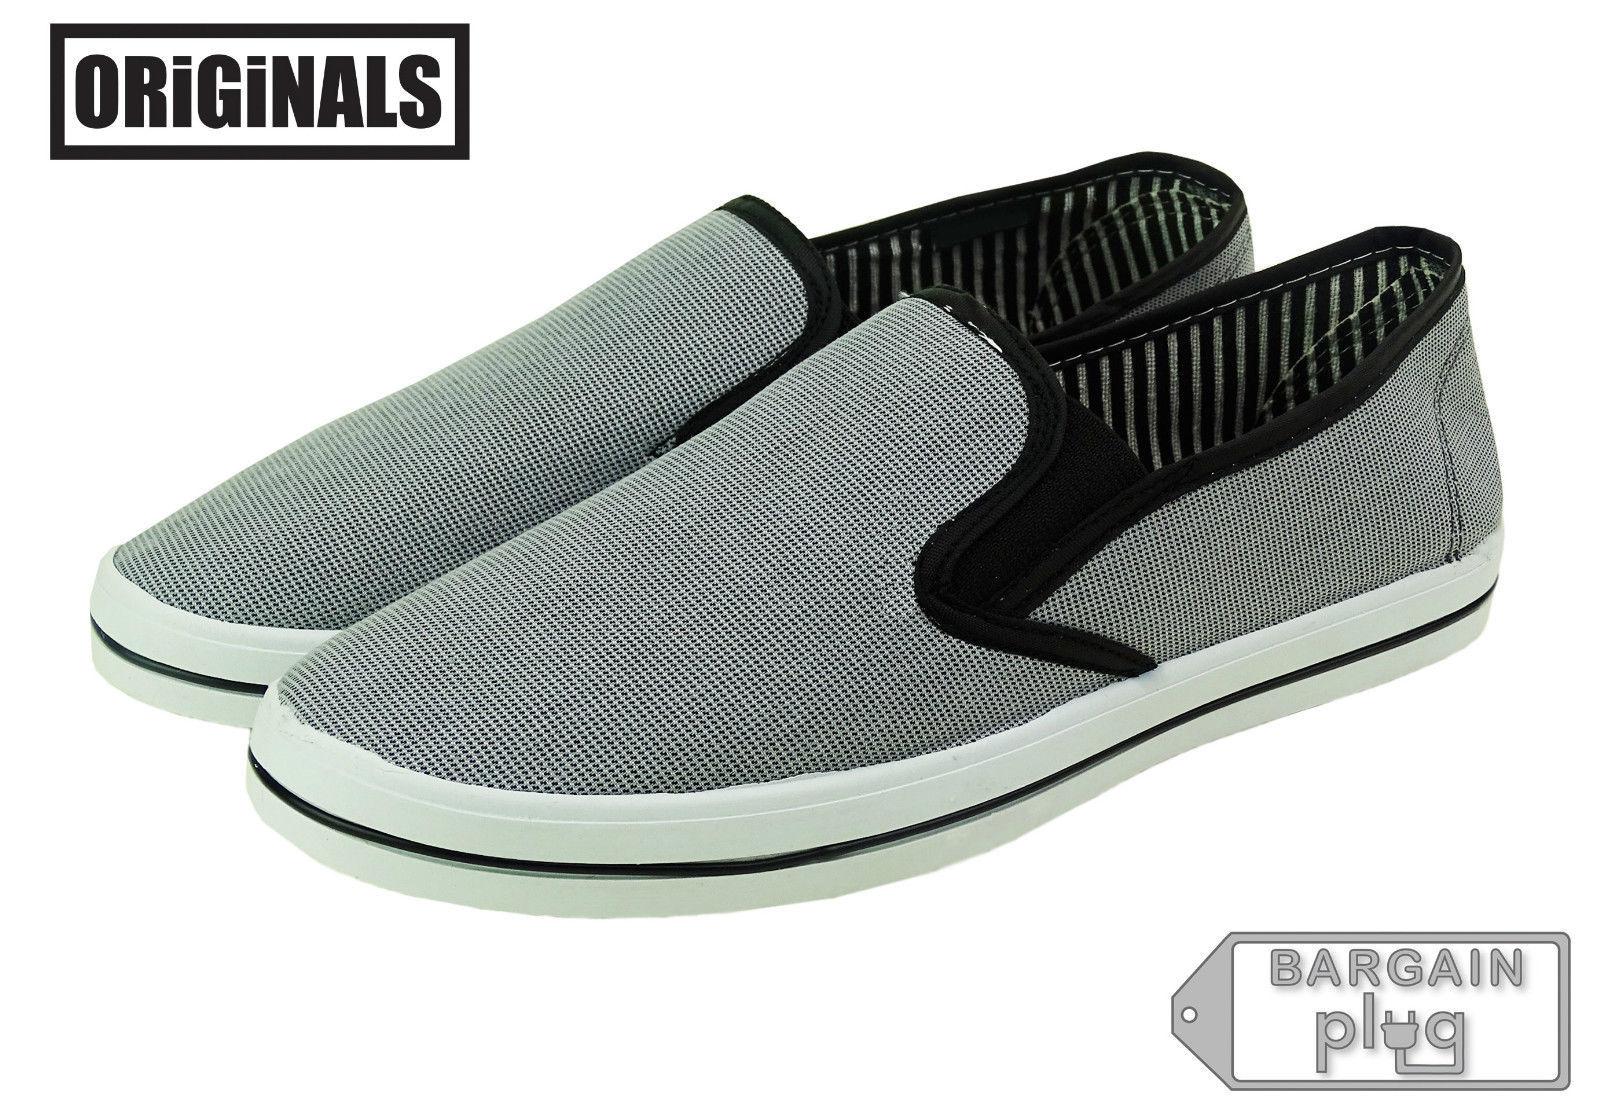 Gray Canvas Shoes Mens Slip On Casual Sneakers Kicks Originals Lowtop Footwear - $13.49